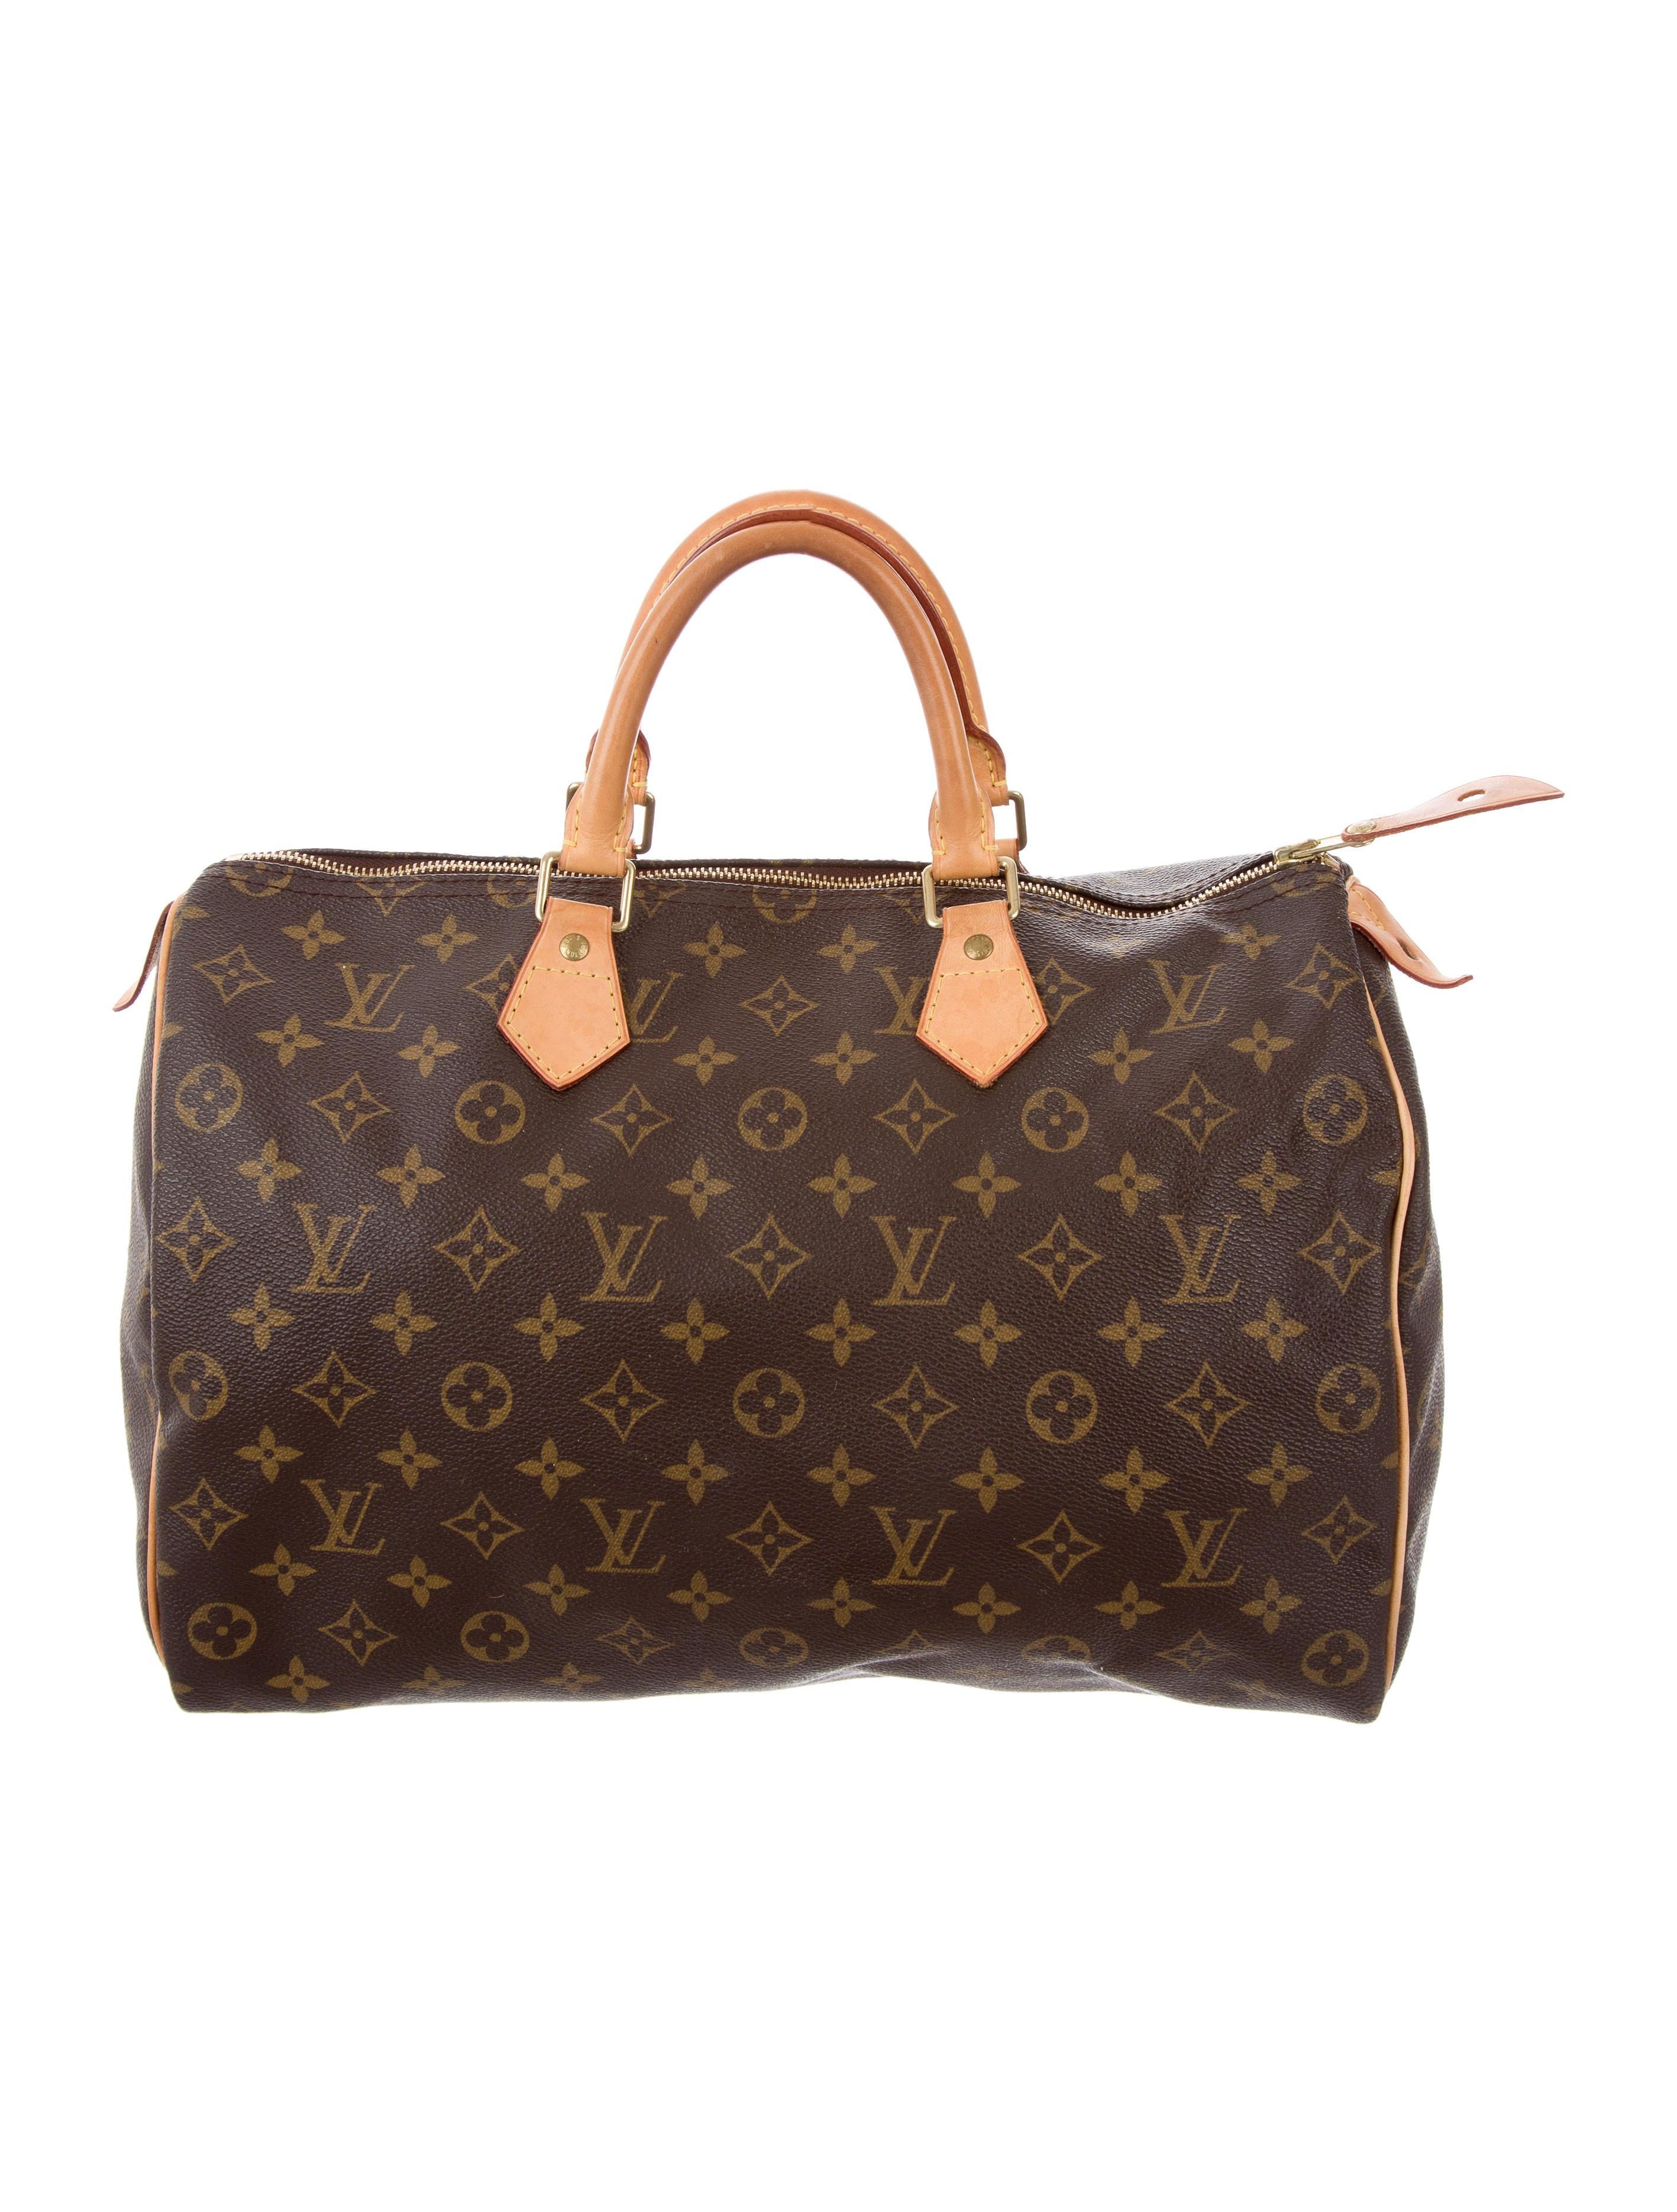 Louis vuitton monogram speedy 35 handbags lou140047 for Louis vuitton miroir speedy 35